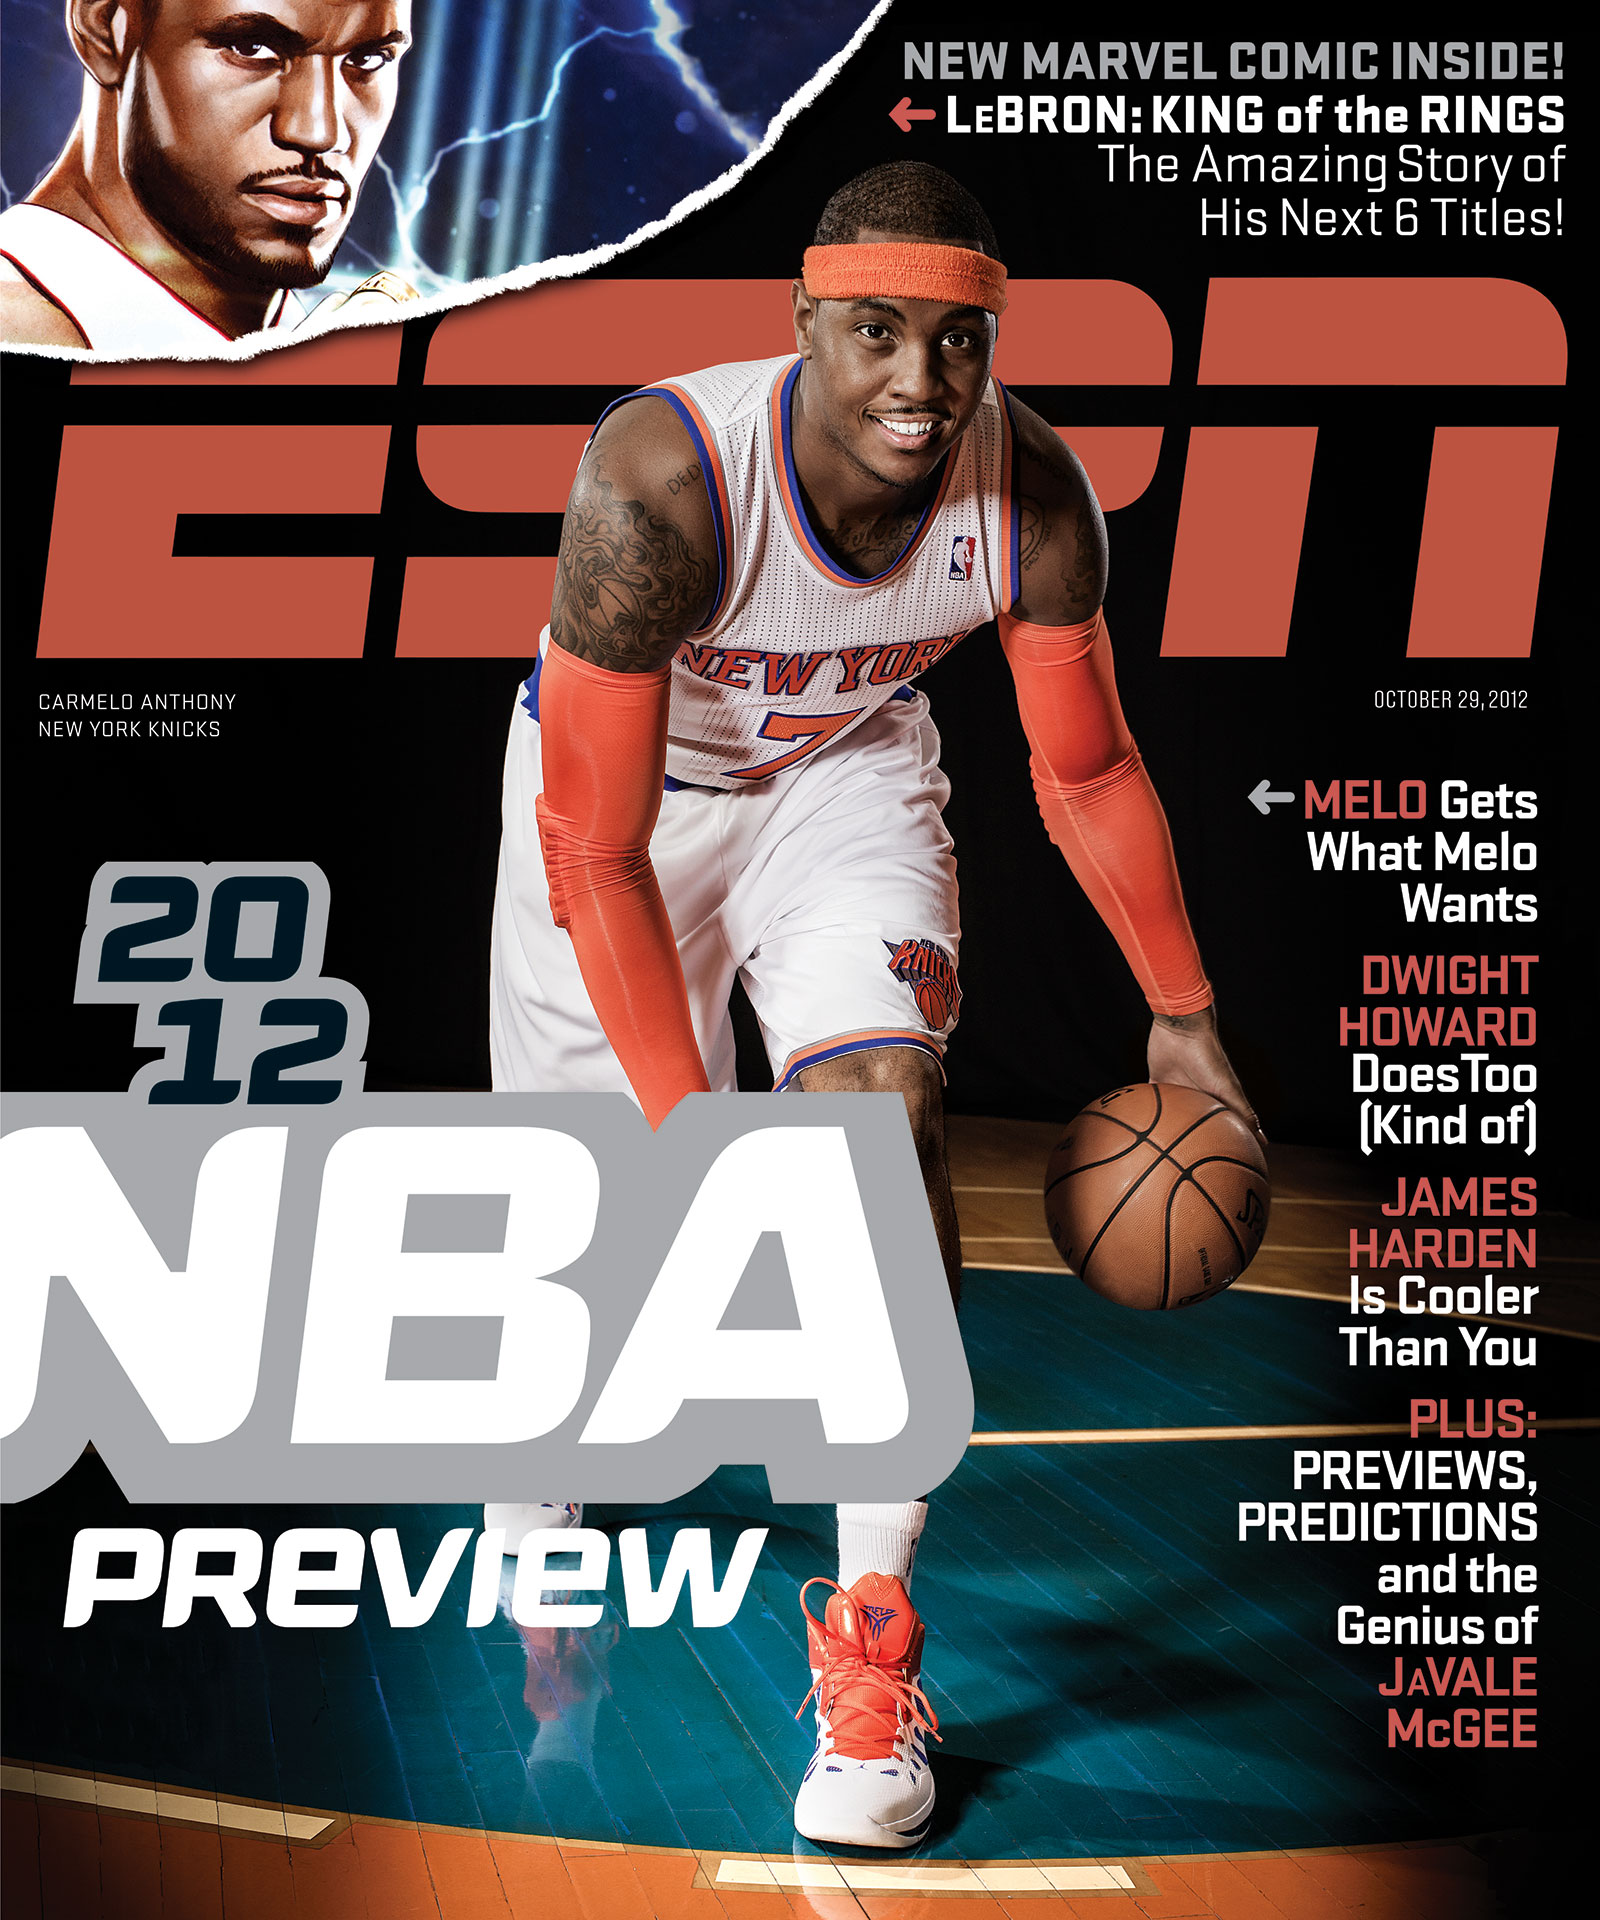 ESPN The Magazine 2012 Covers